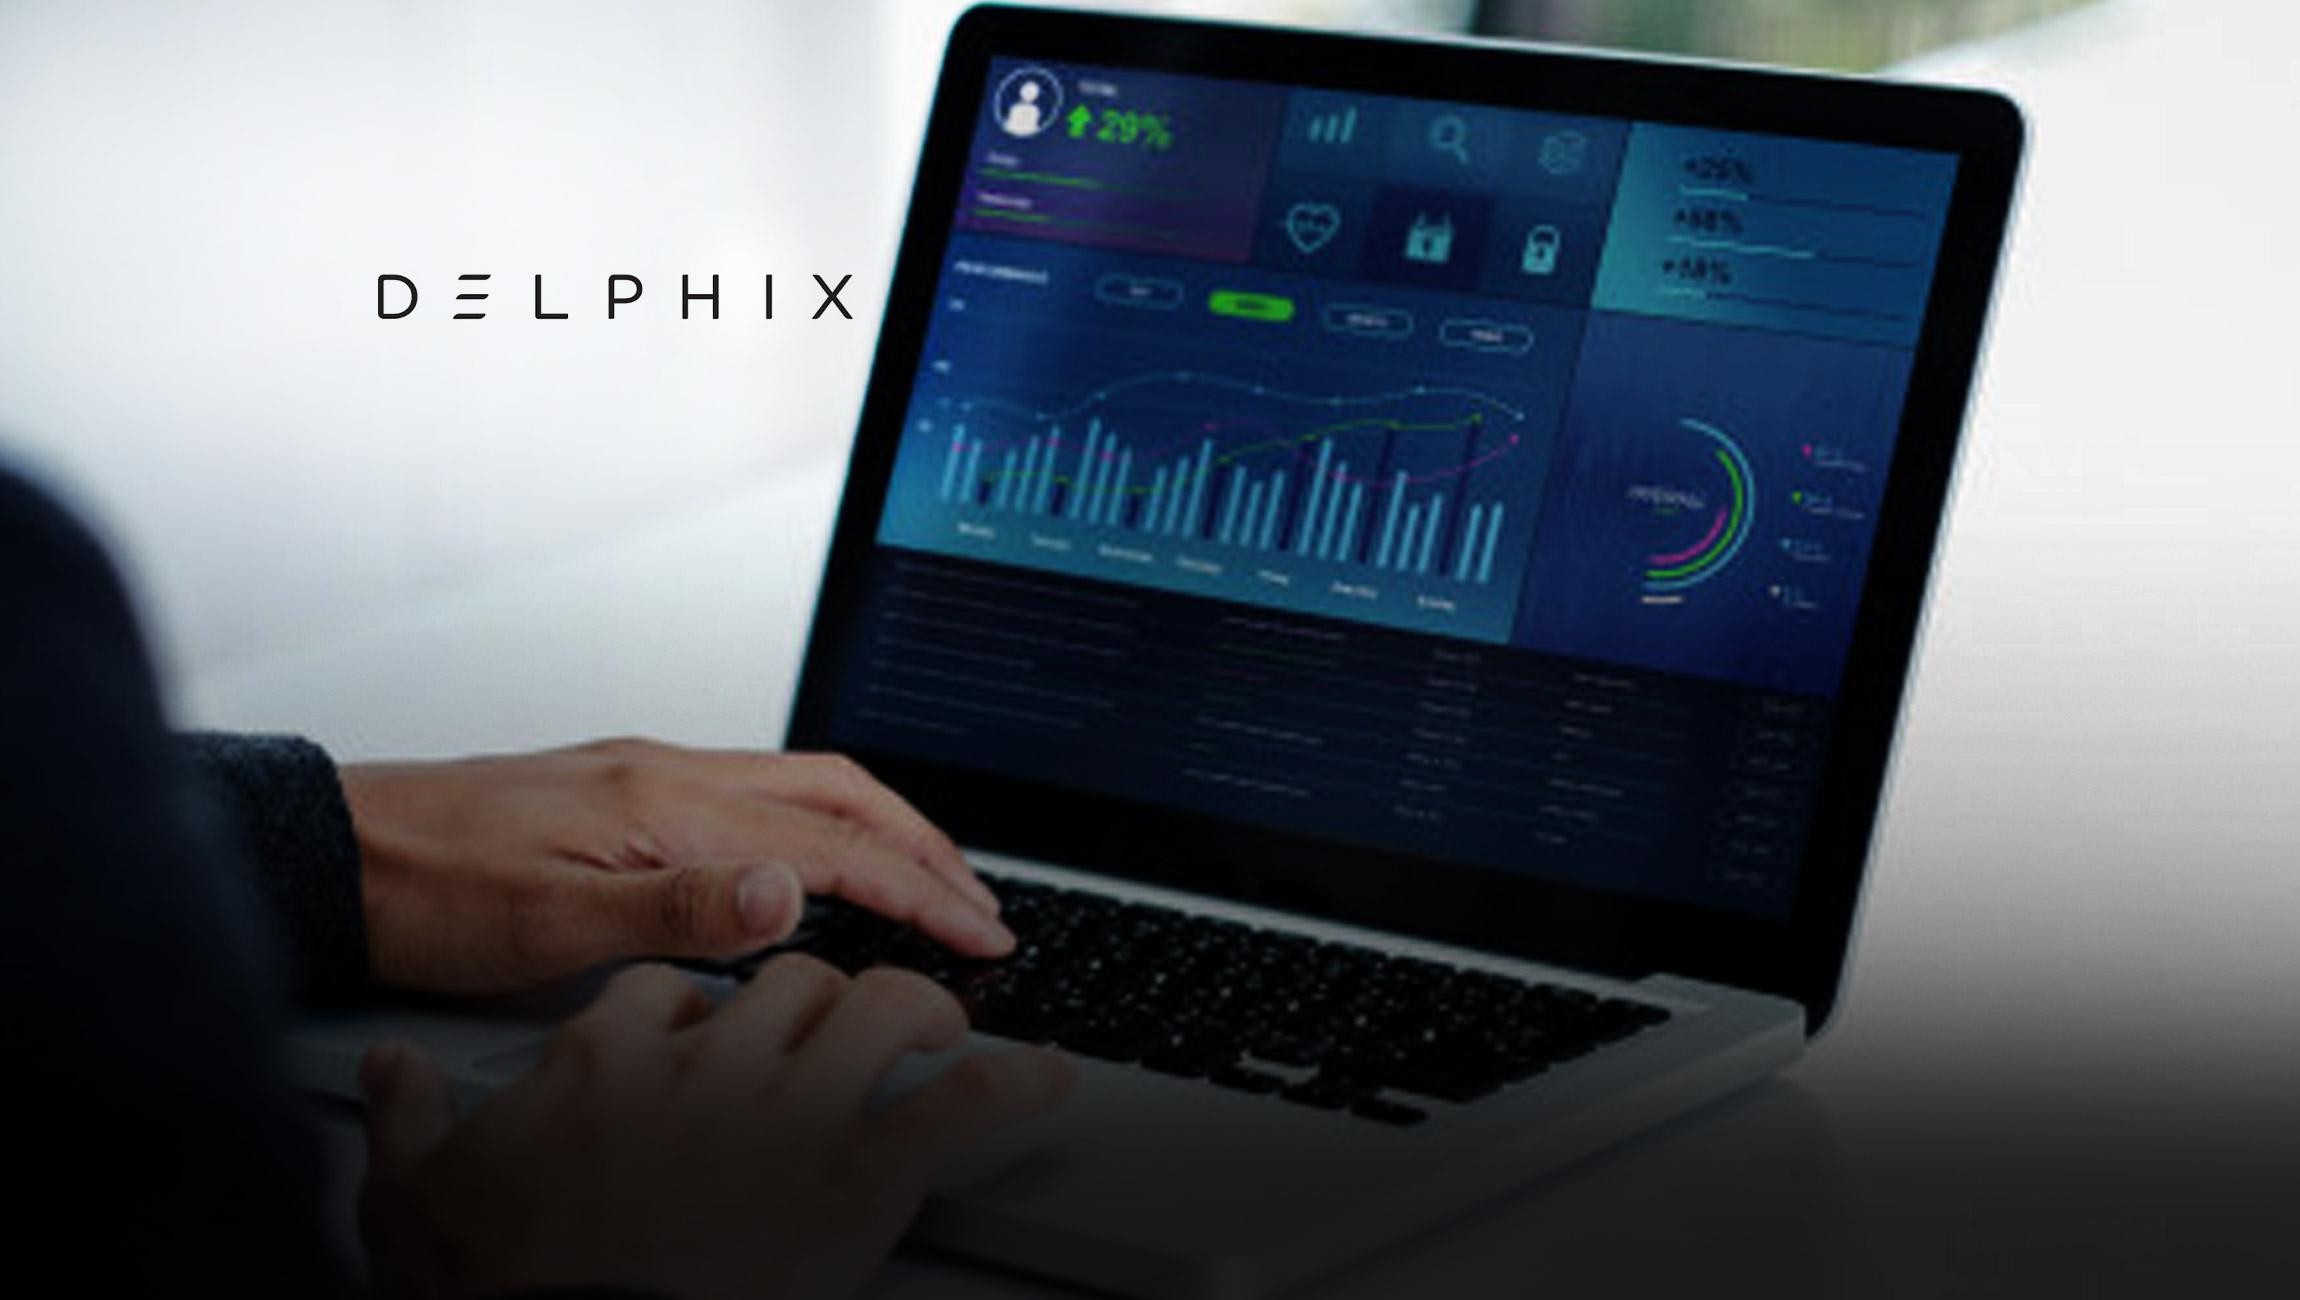 Delphix DevOps Data Platform Achieves SAP Certified Integration with SAP NetWeaver and SAP S/4HANA